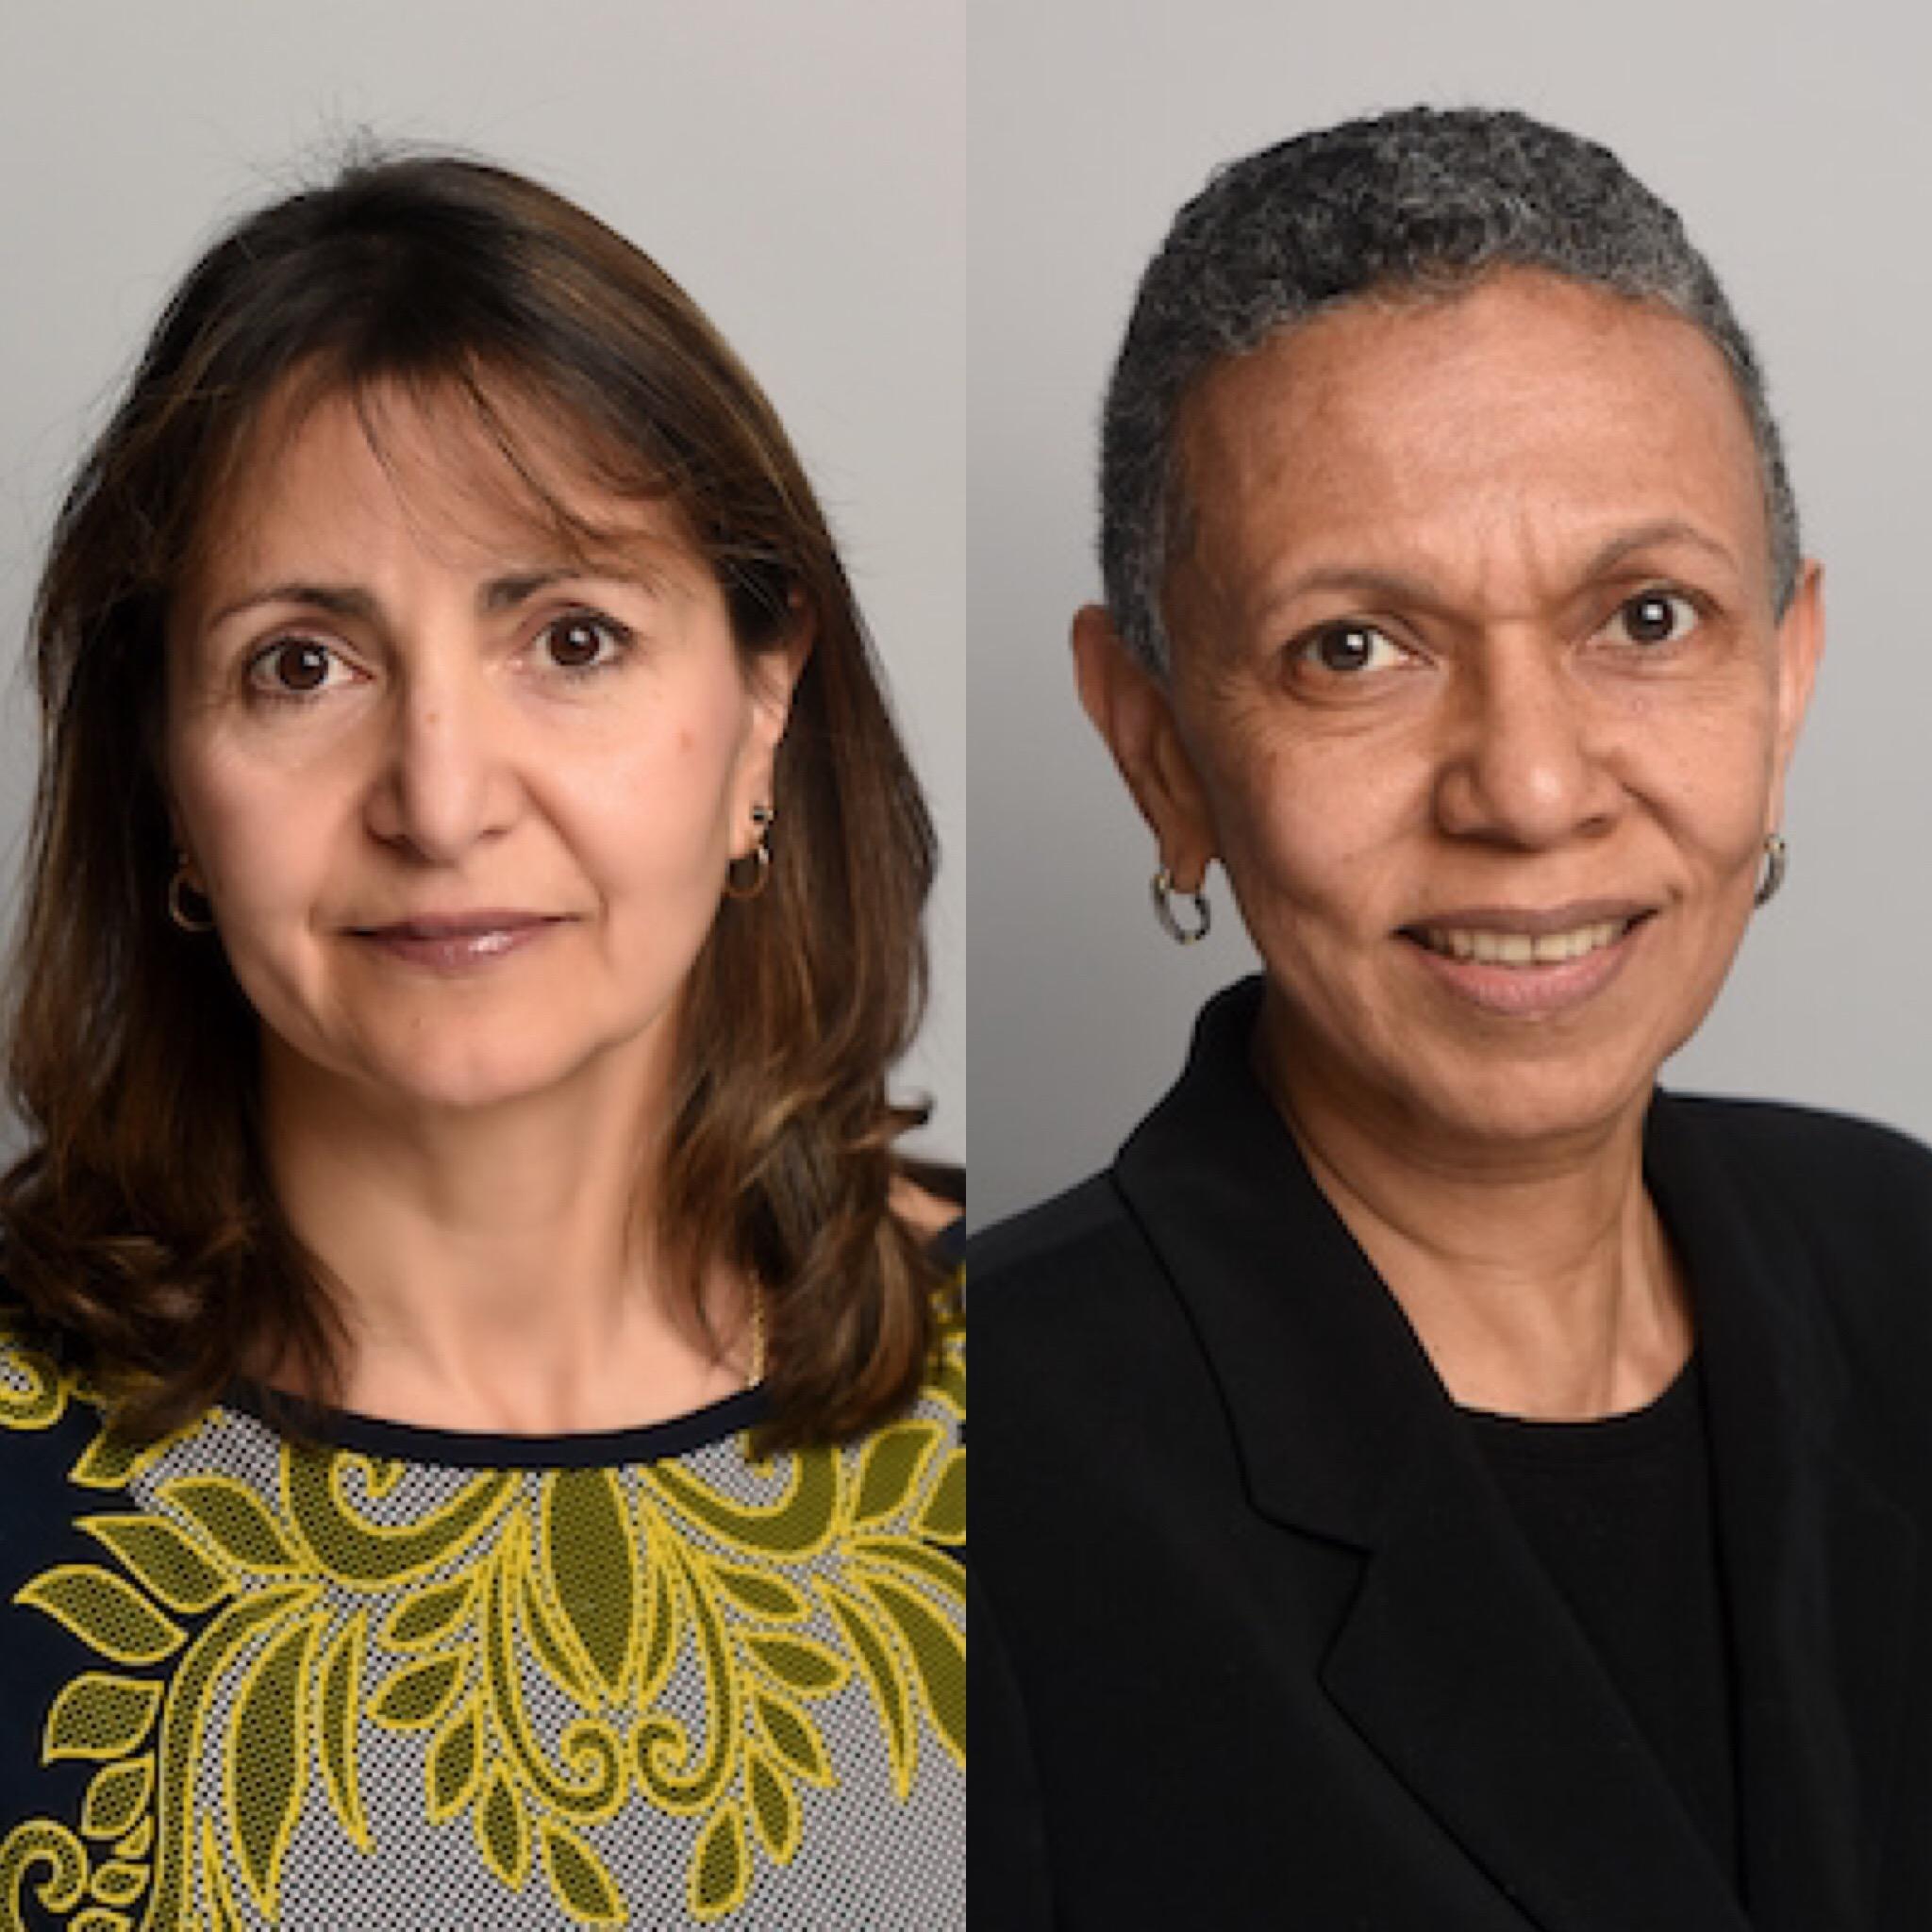 Associate Professor Diana Romero (left) and Distinguished Professor Luisa N. Borrell